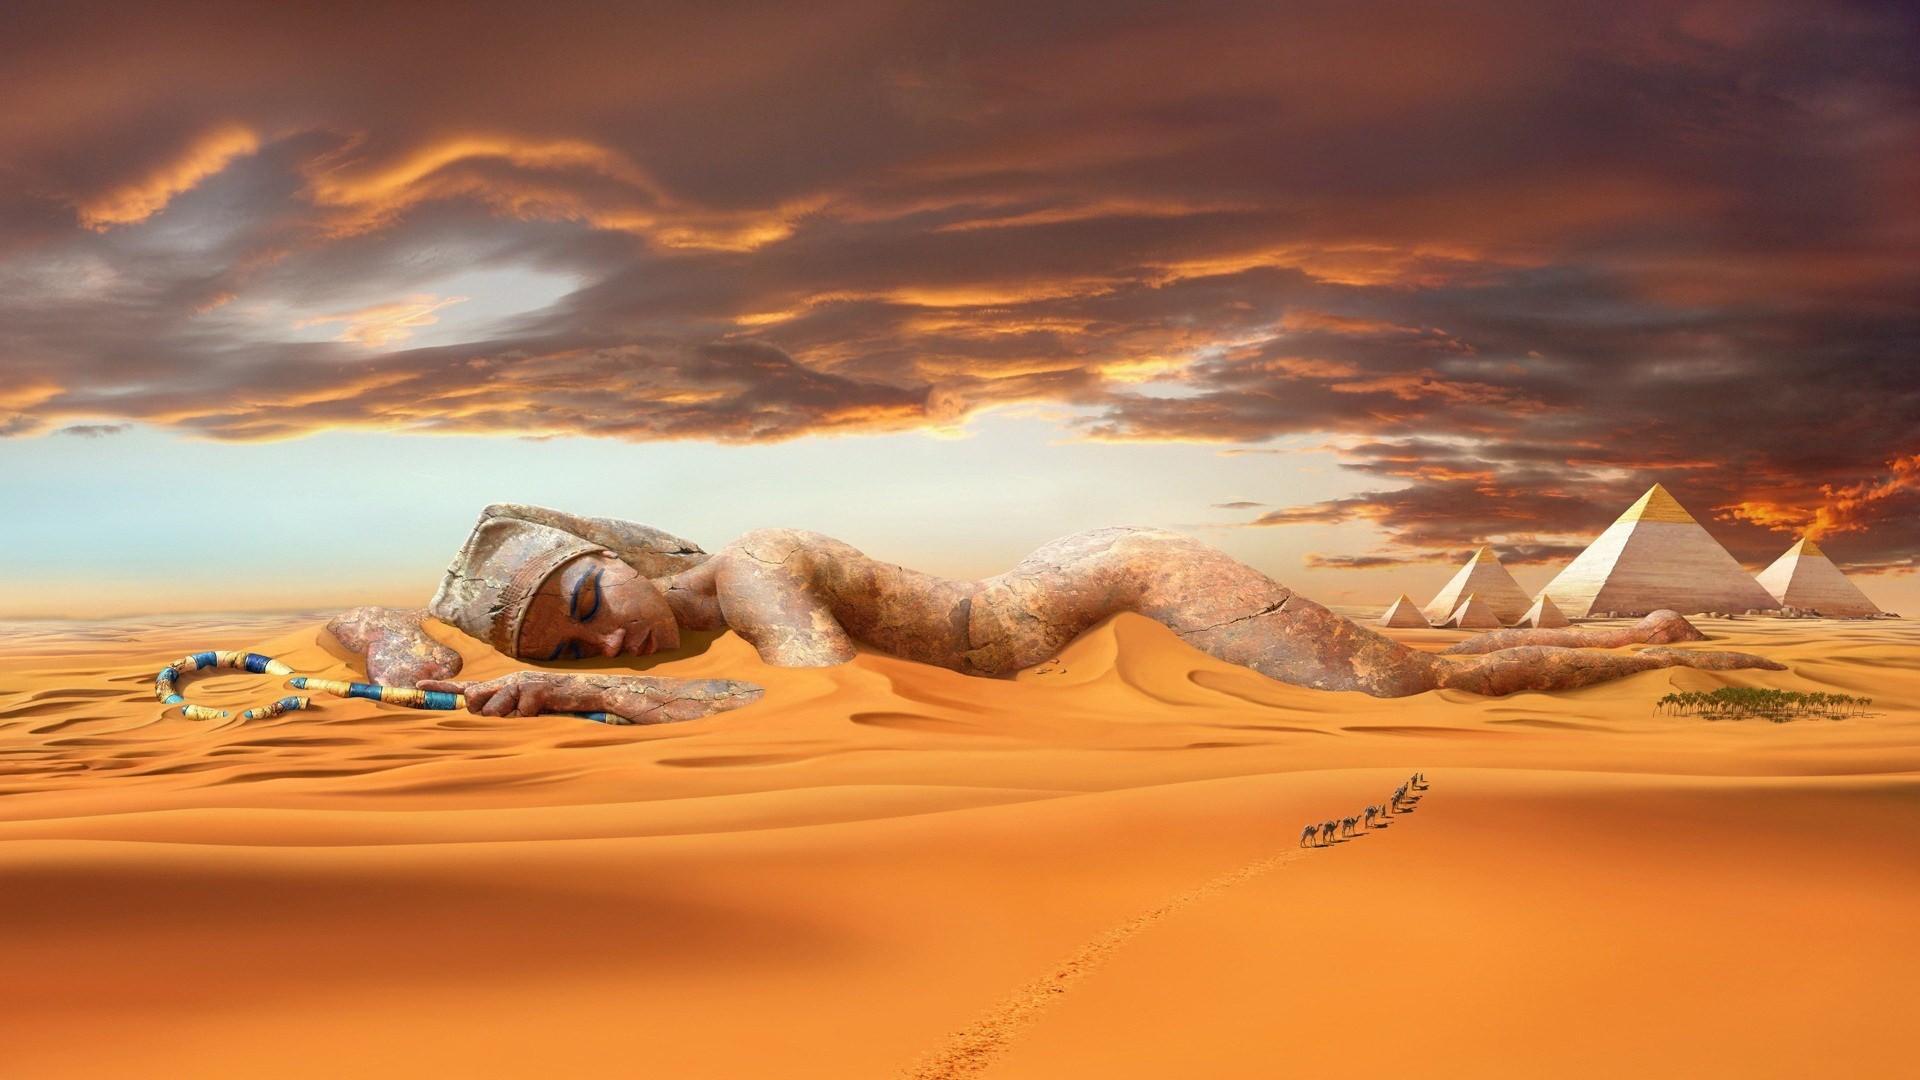 high fashion egypt | View Egypt Desert Statue Oasis Camels Sand HD Wallpaper